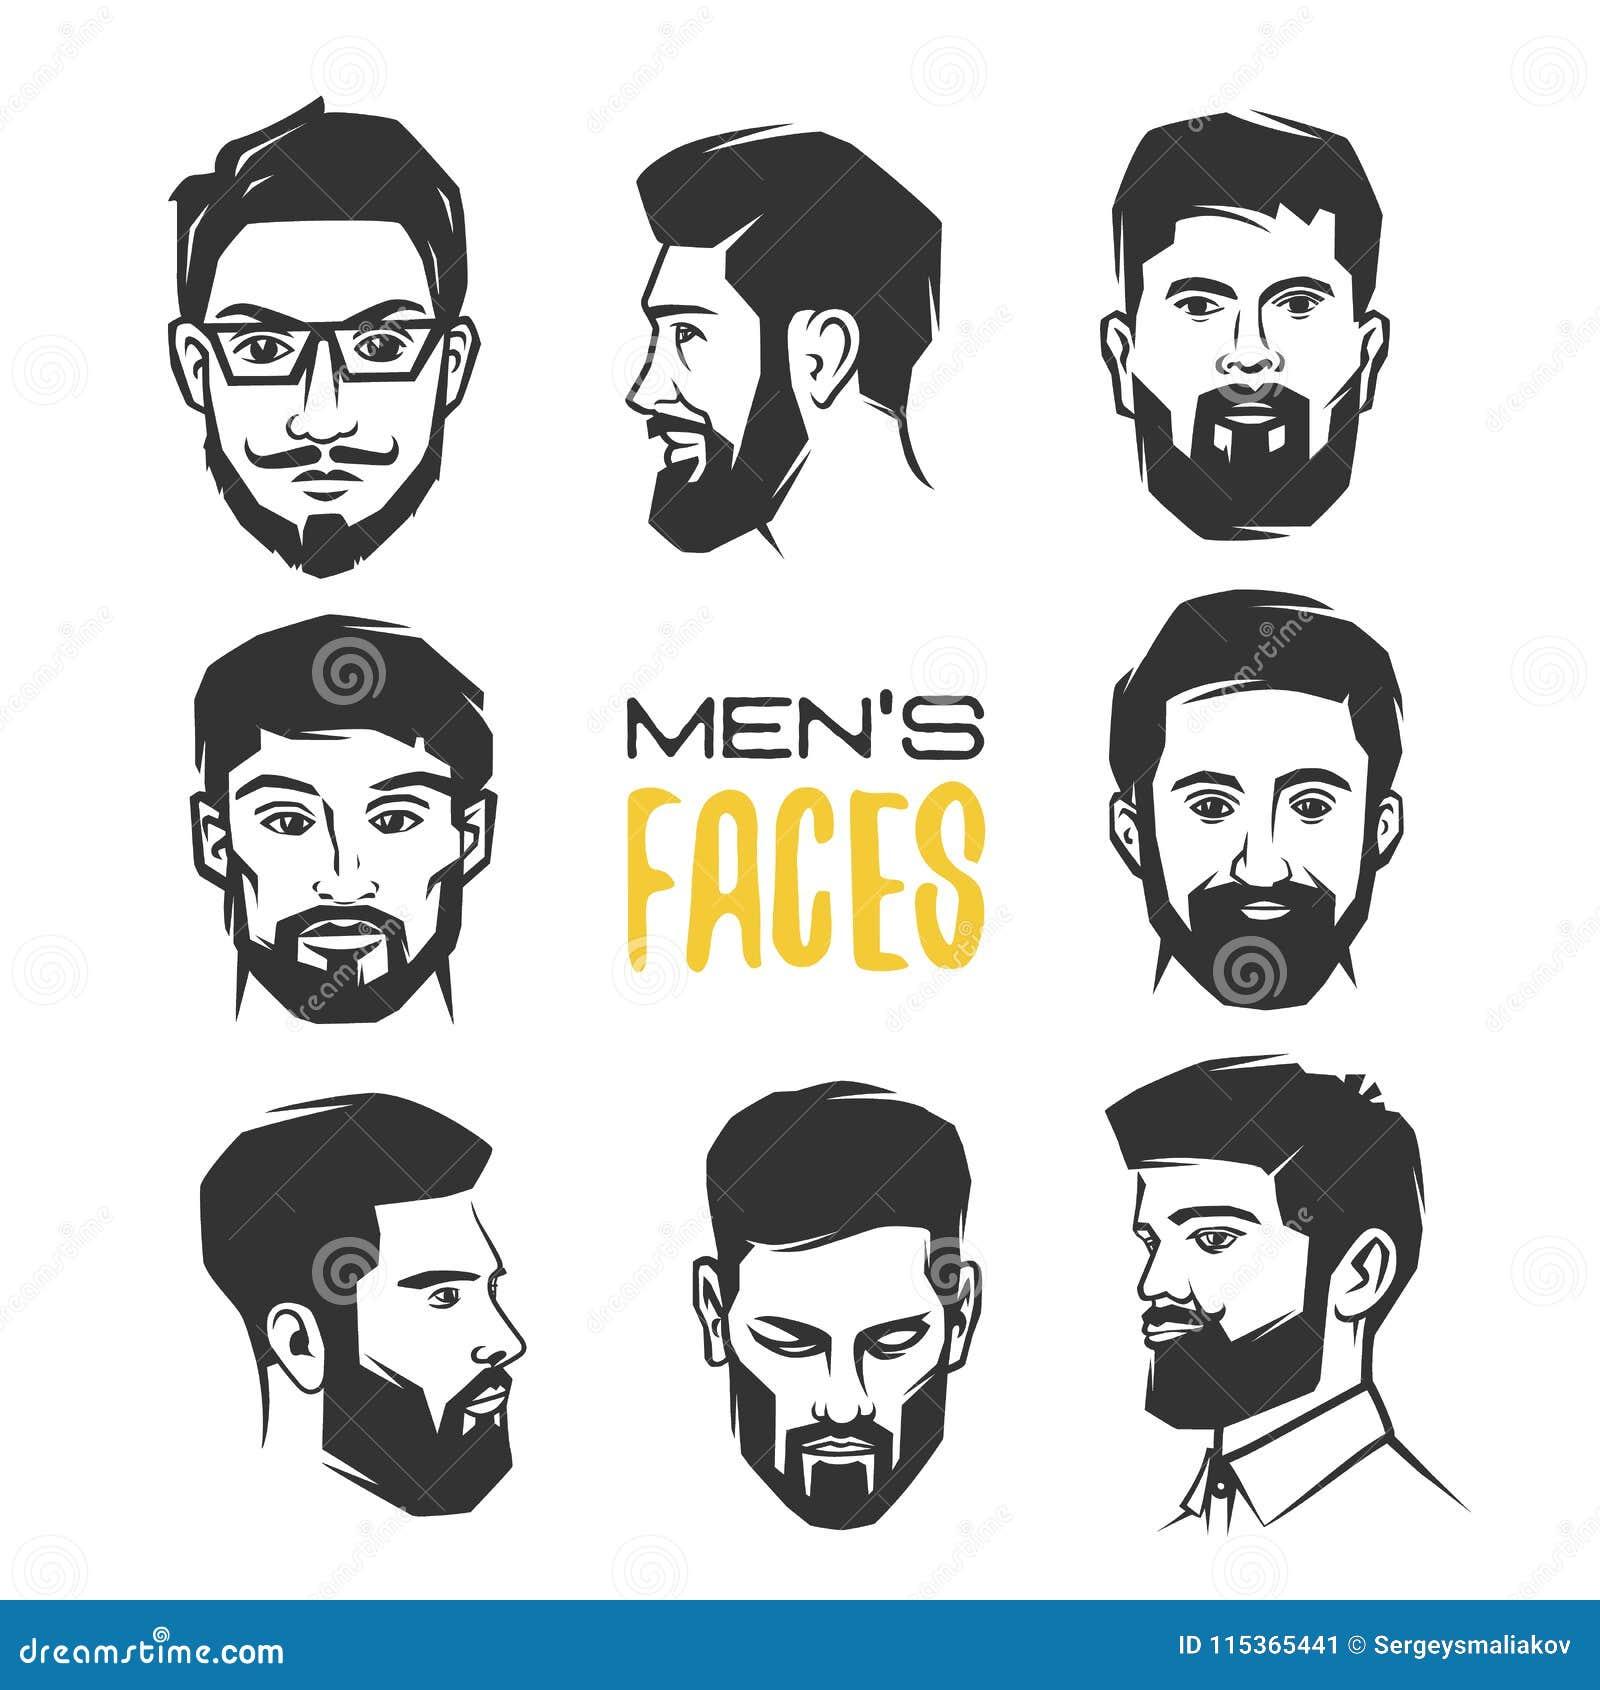 Man`s face with beard.